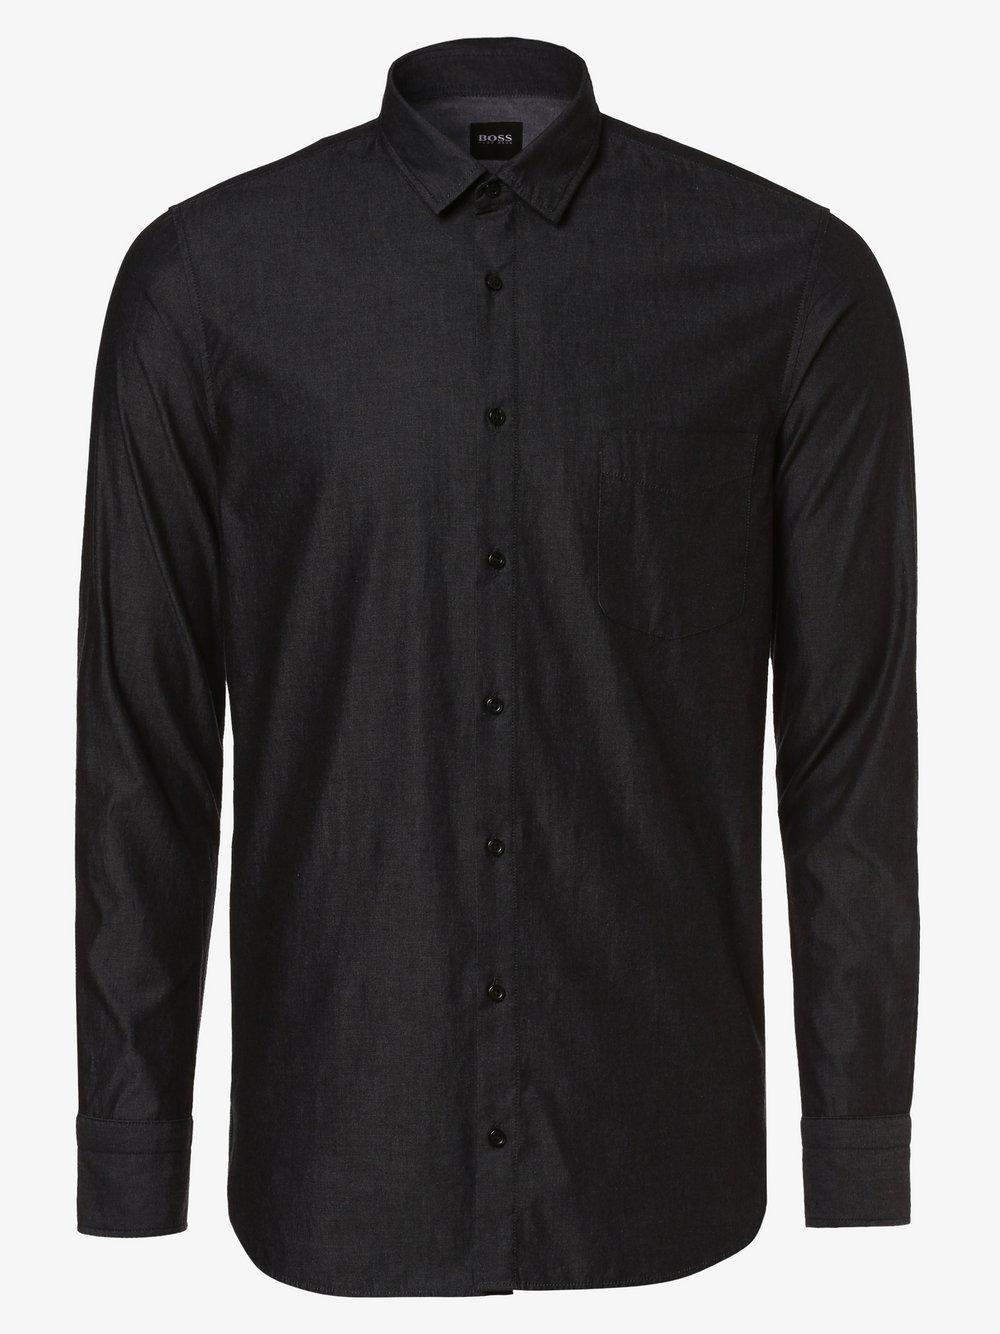 BOSS Casual – Koszula męska – Magneton_1, czarny Van Graaf 455736-0001